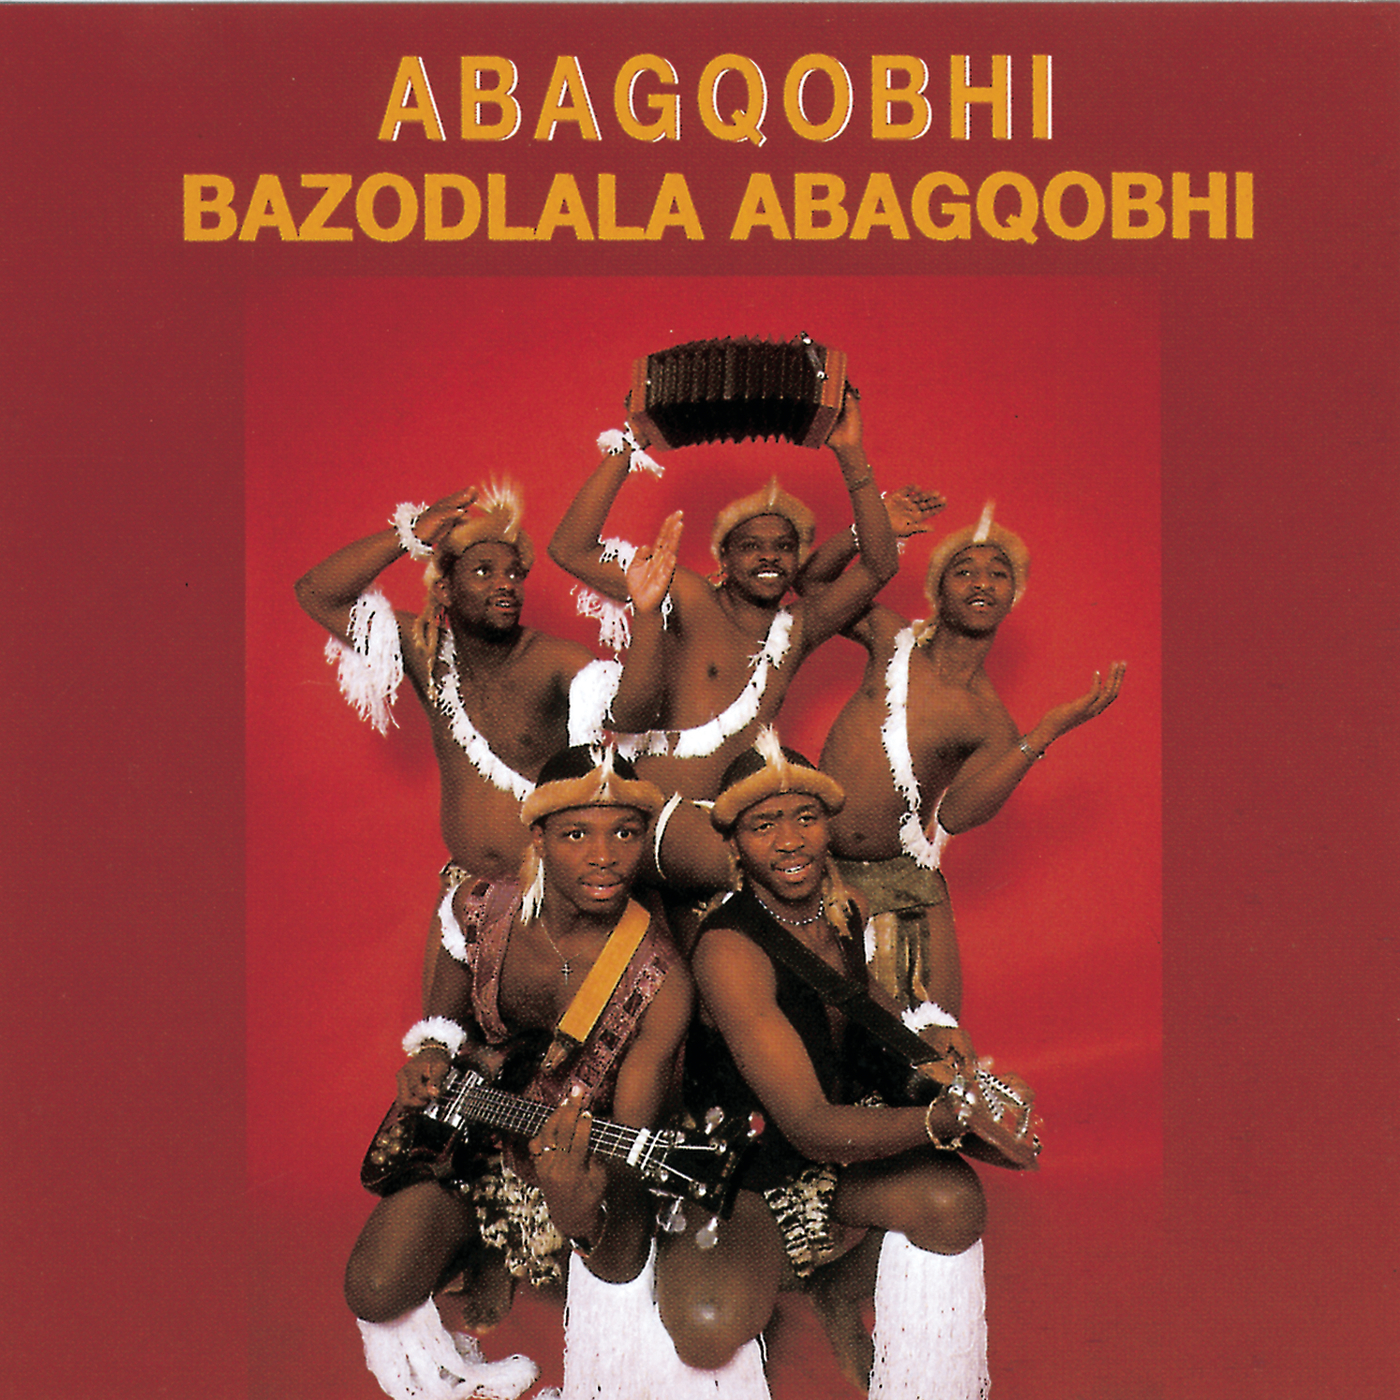 Bazodlala Abagqobi - Abagqobhi